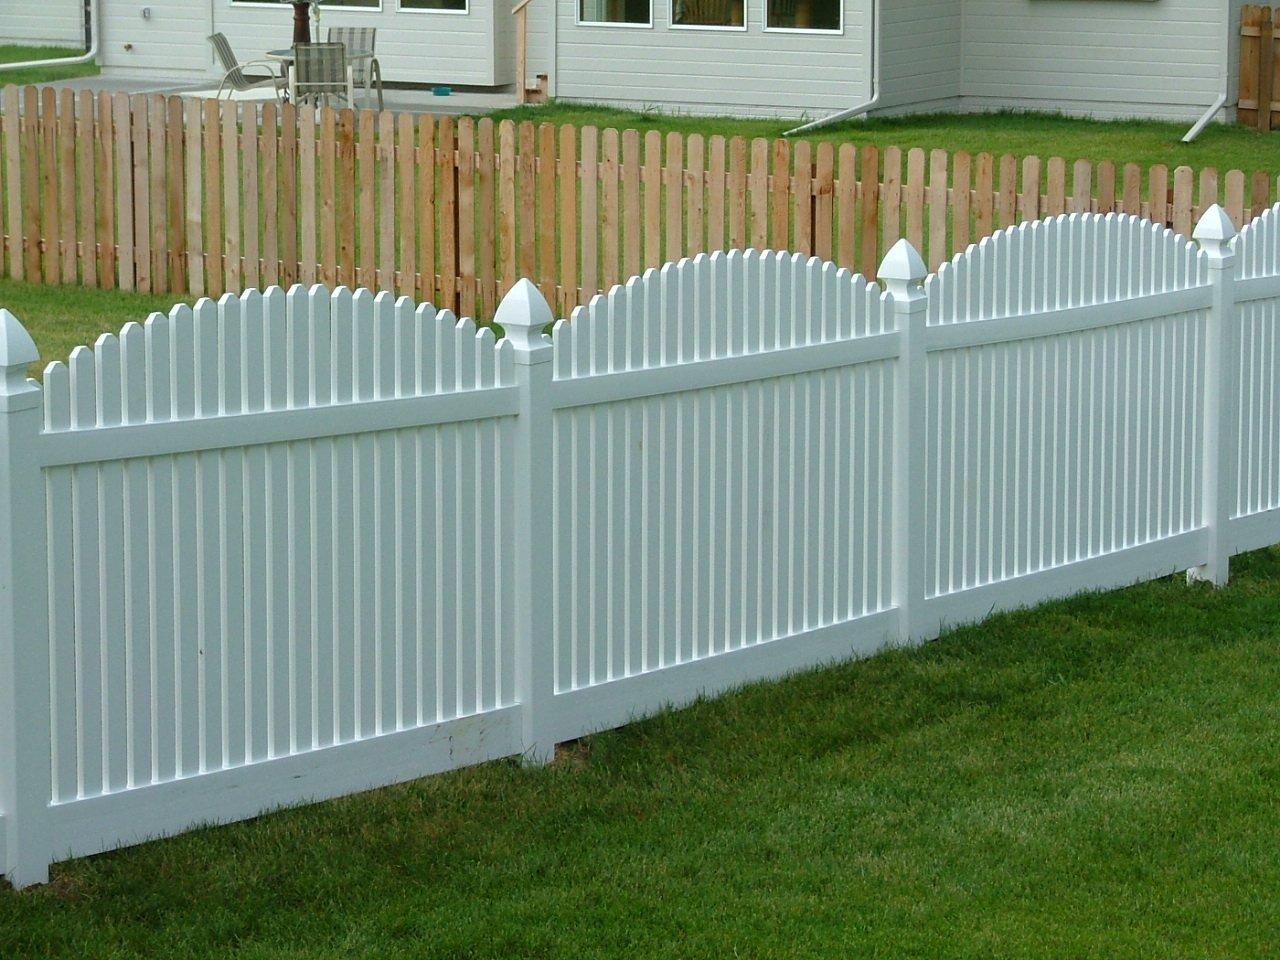 Dakota Fence & Deck 4' white pvc picket with gothic caps - Omaha and Papillion, Nebraska